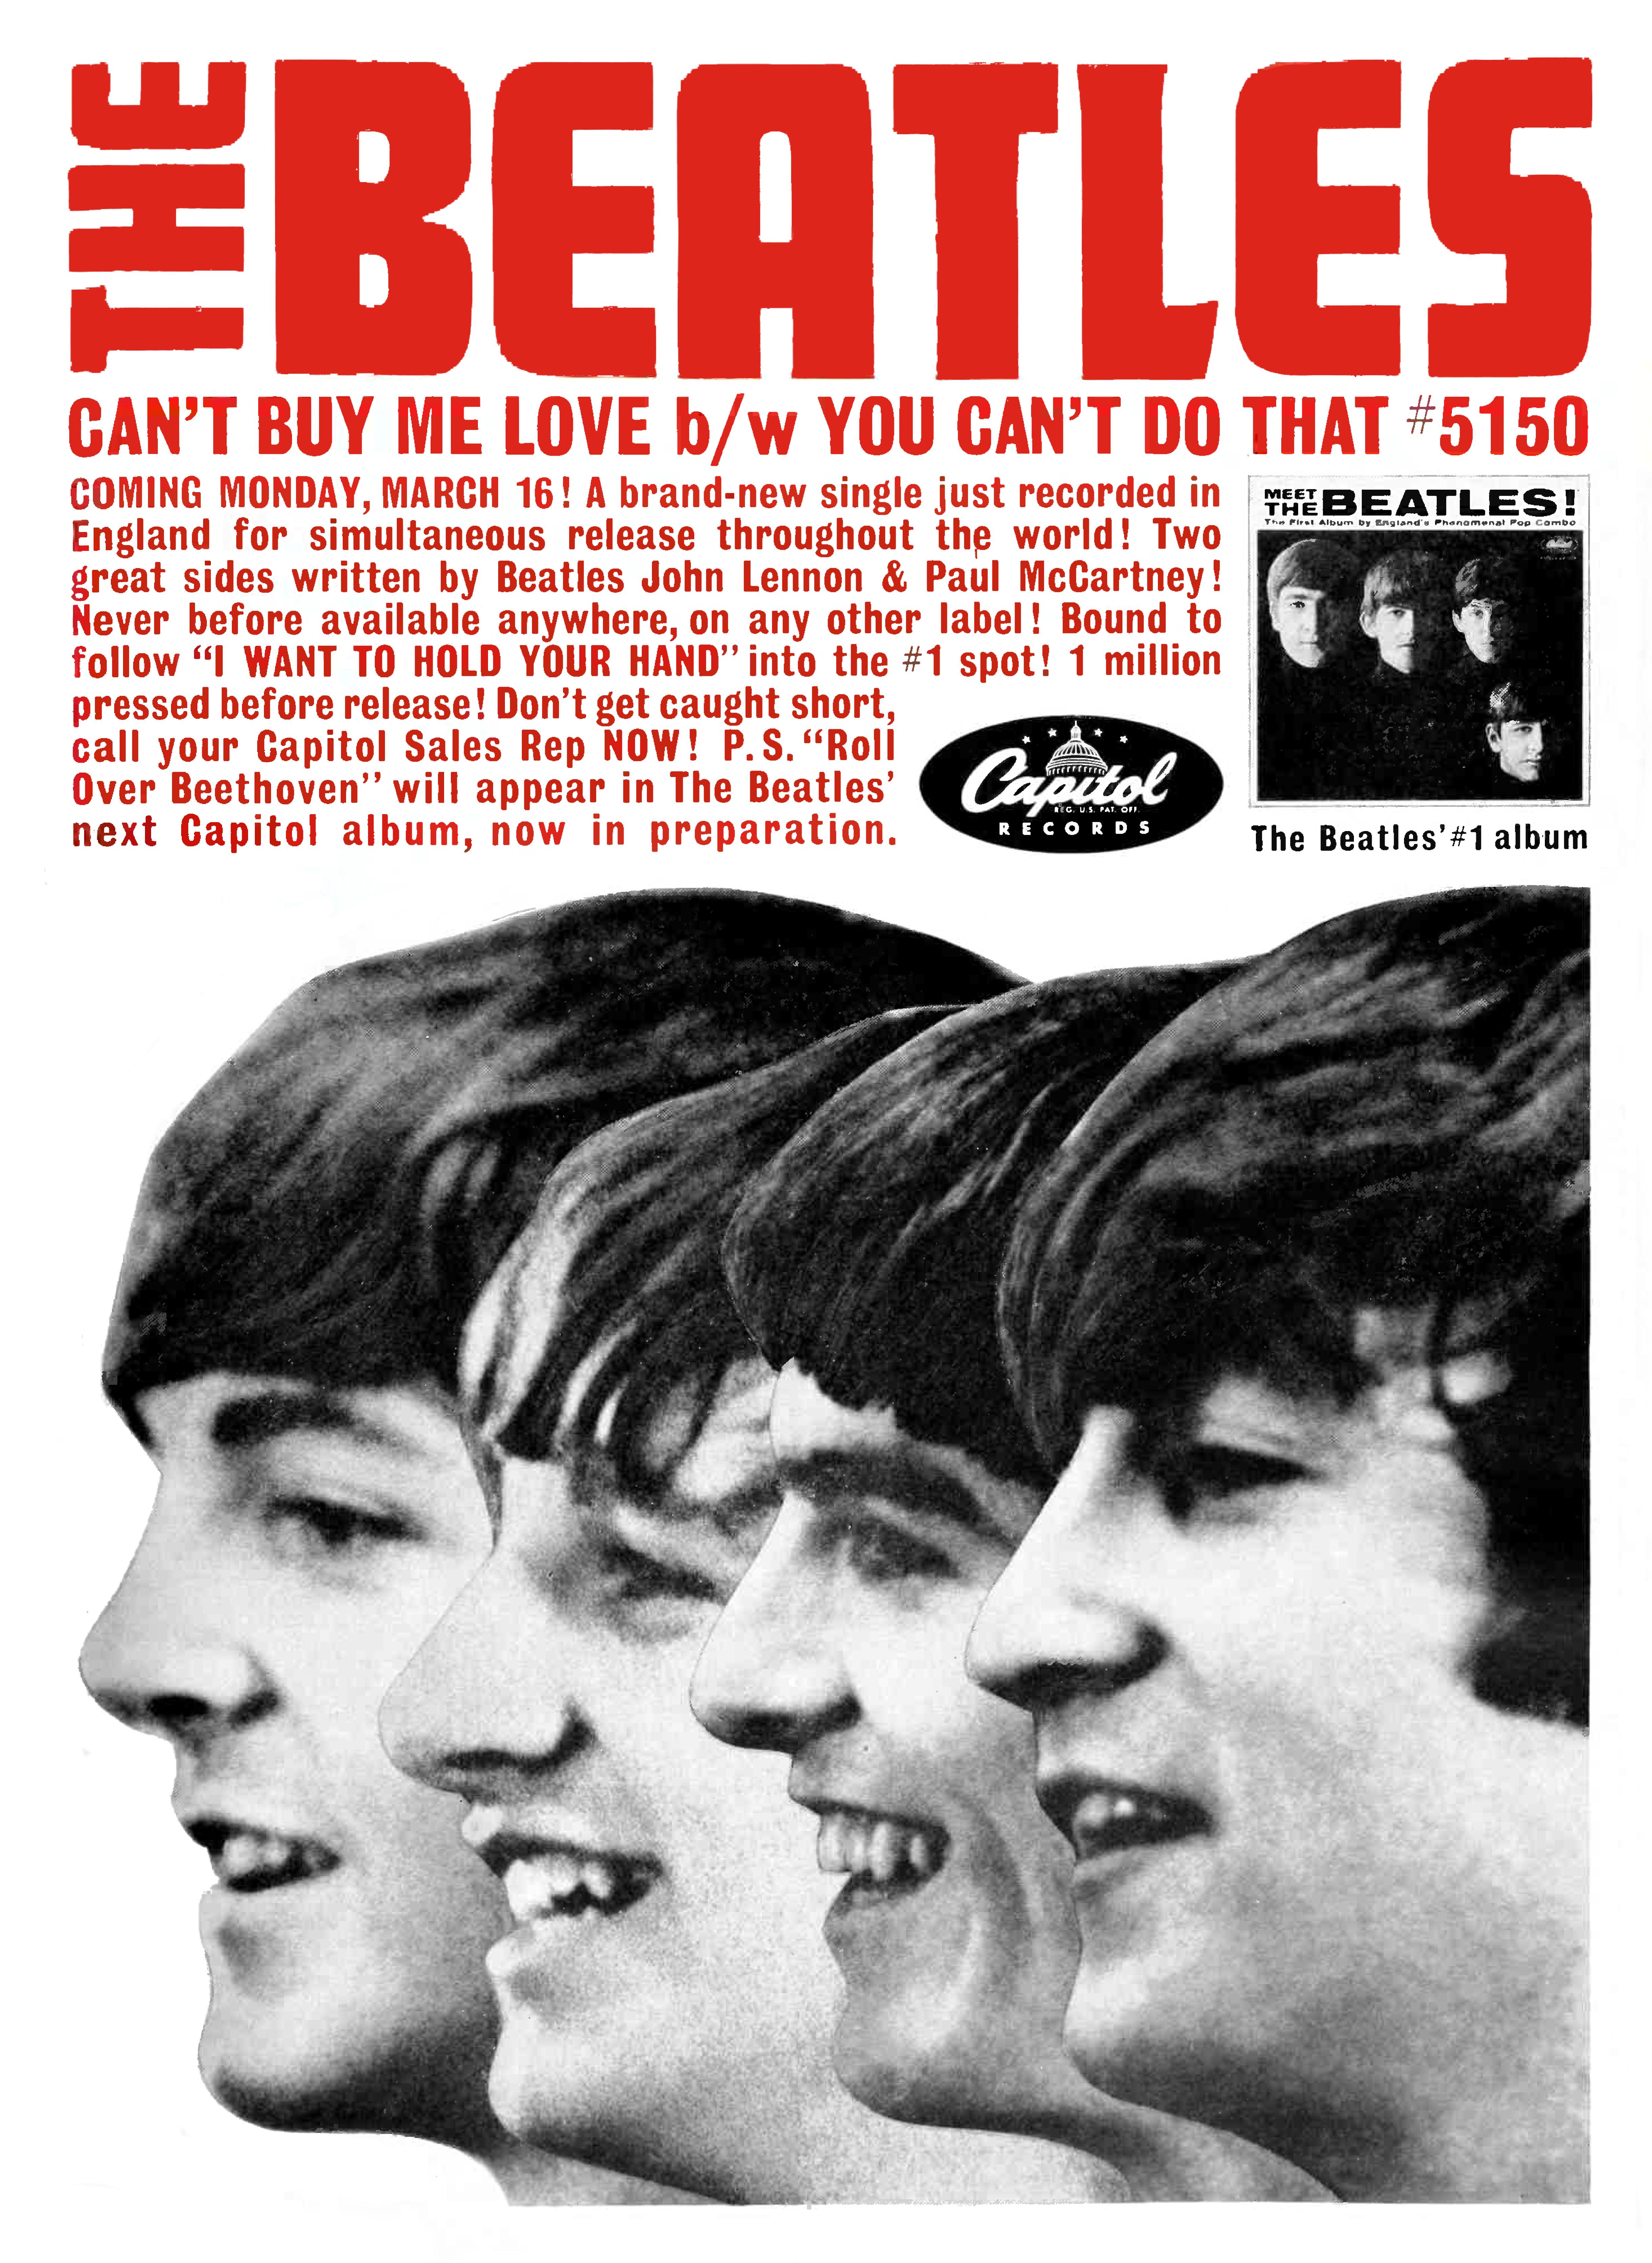 The Beatles - Can't Buy Me Love b/w You Can't Do That - 1964